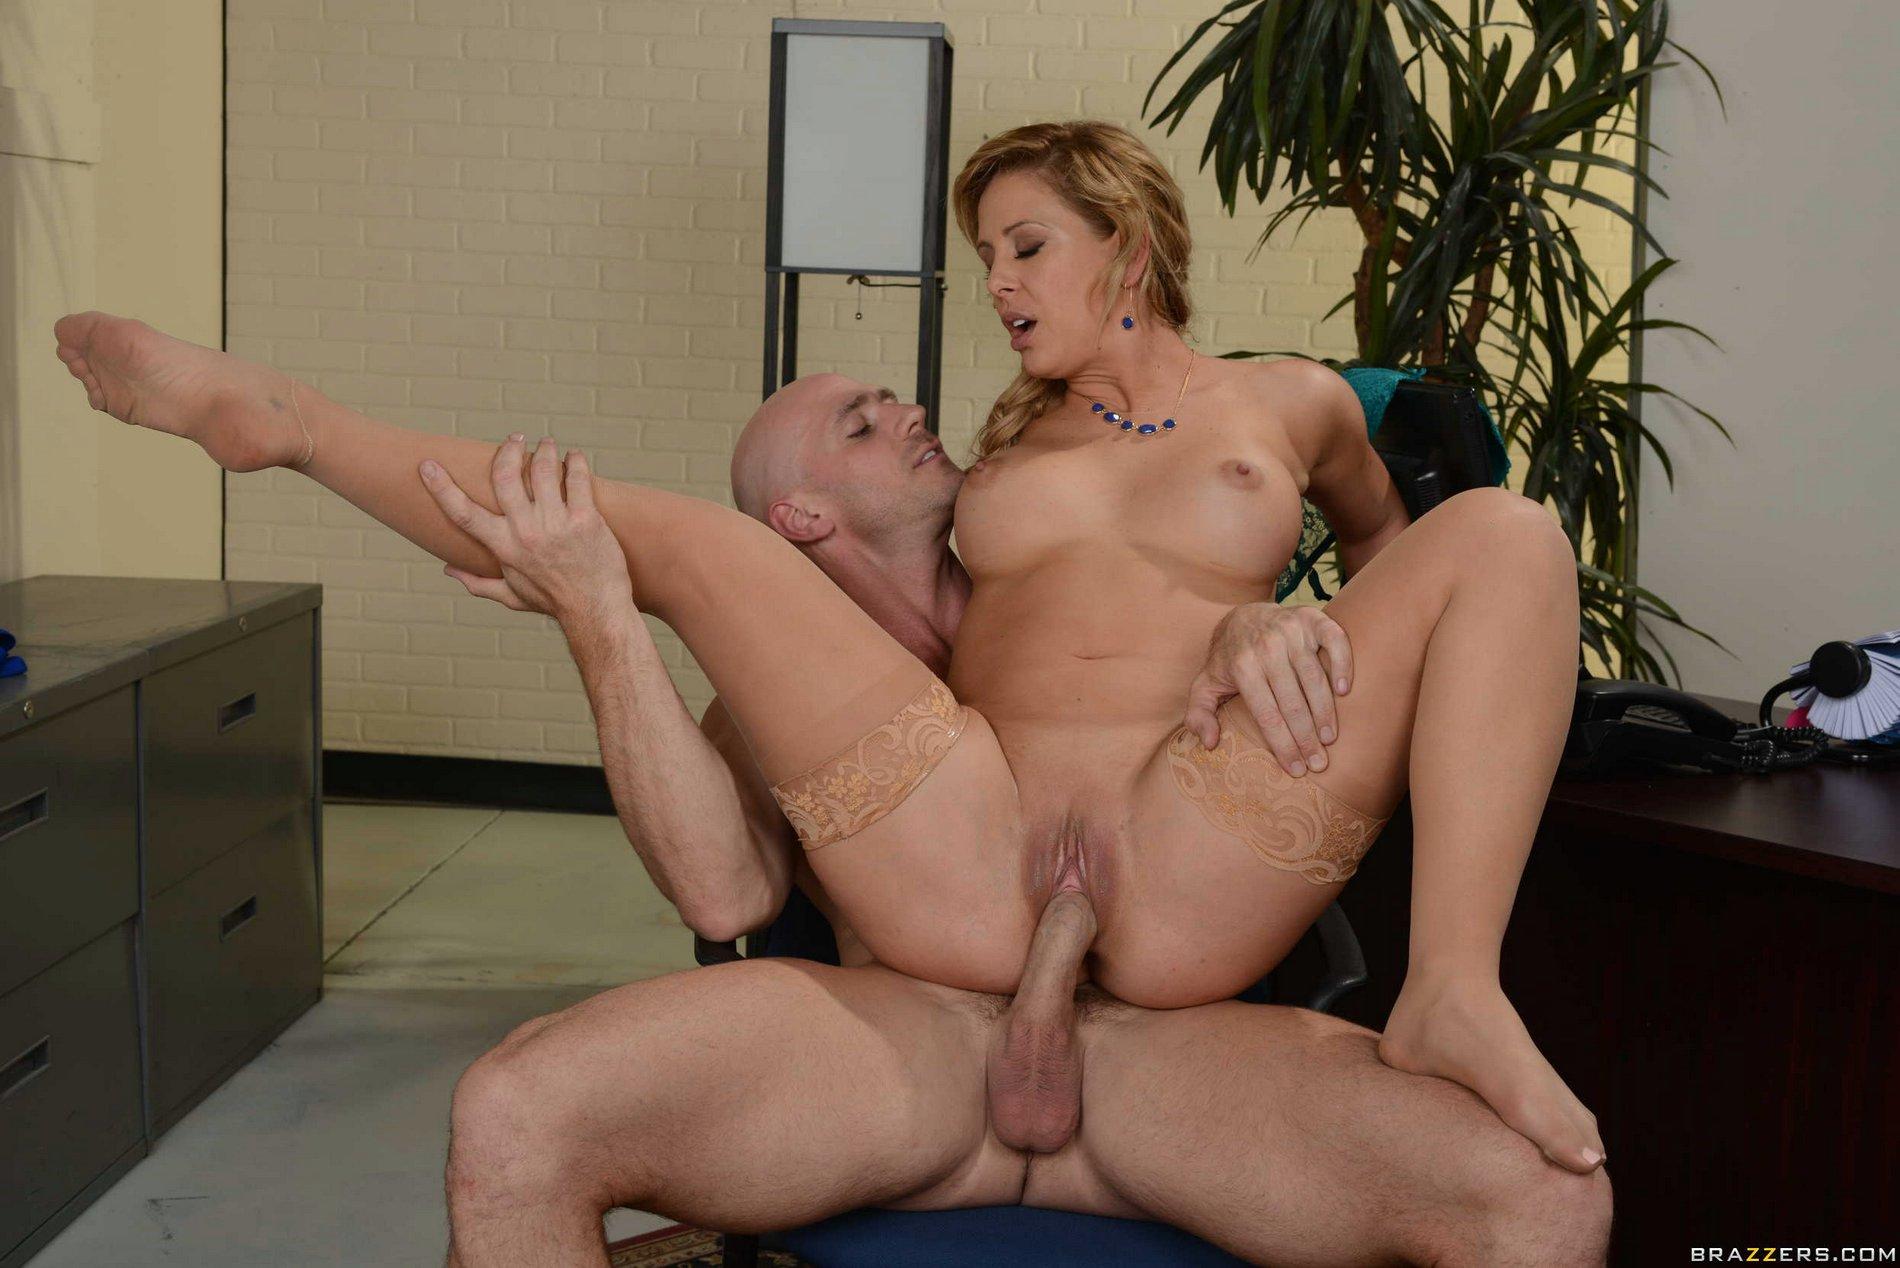 marisa tomei nude sex video